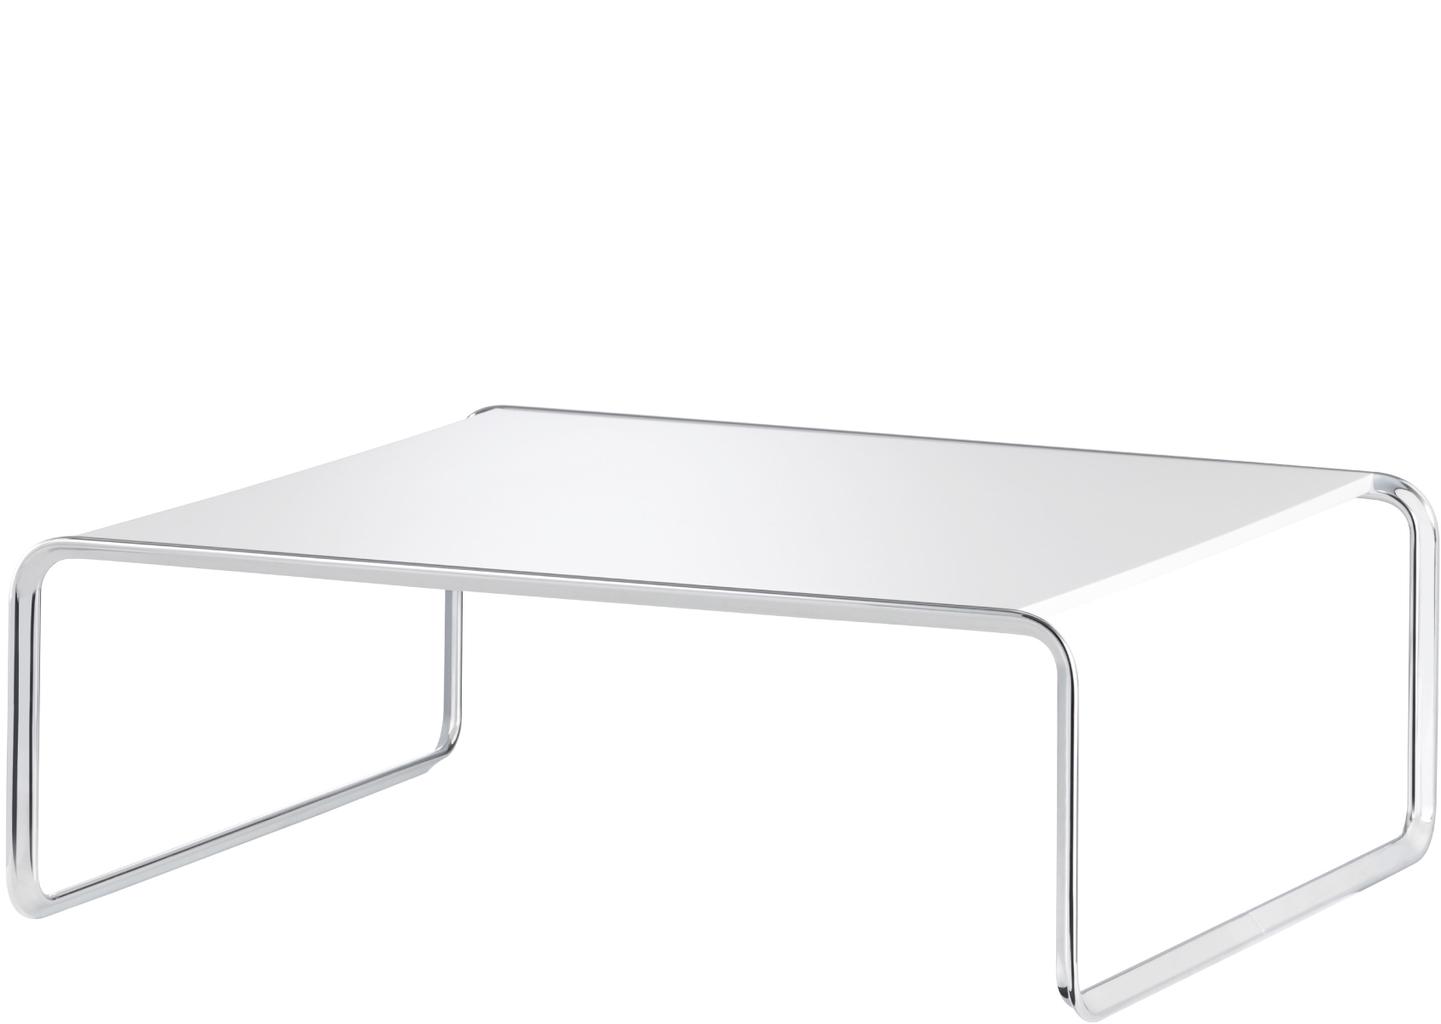 designwebstore tecta k1a und k1as wei k1a. Black Bedroom Furniture Sets. Home Design Ideas